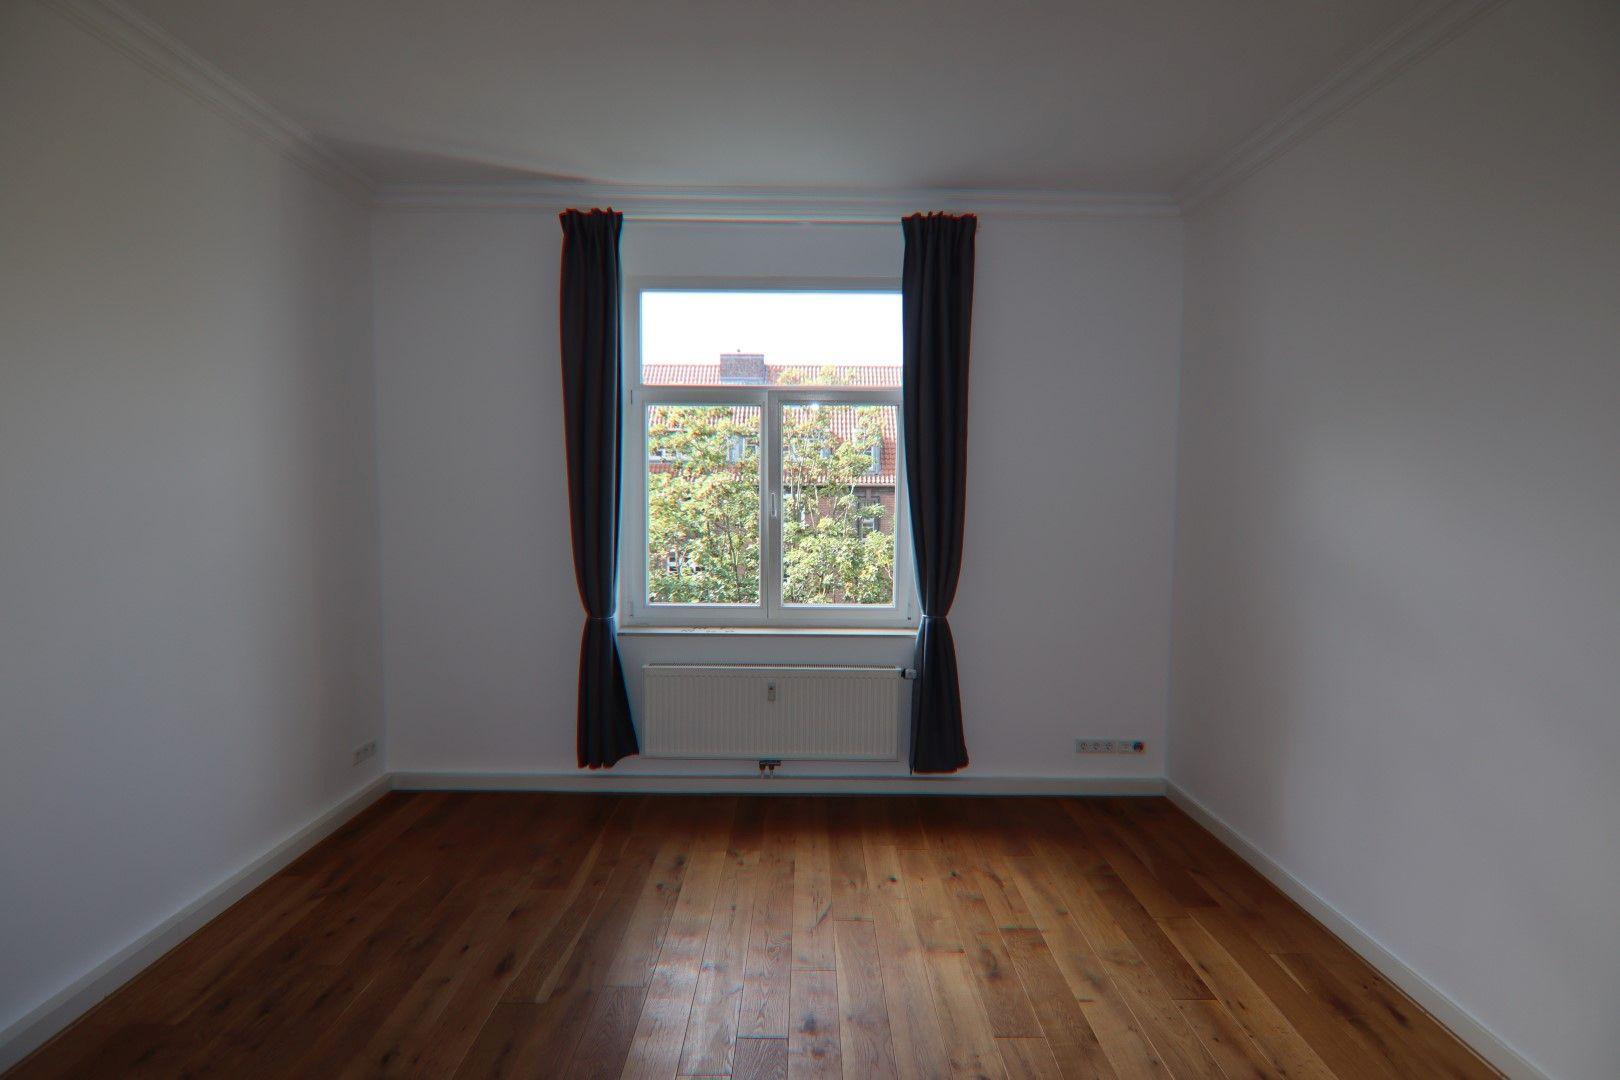 Immobilie Nr.0271 - 3-Zimmer-Altbauwohnung mit Aufzug im 3.OG - Bild main.jpg